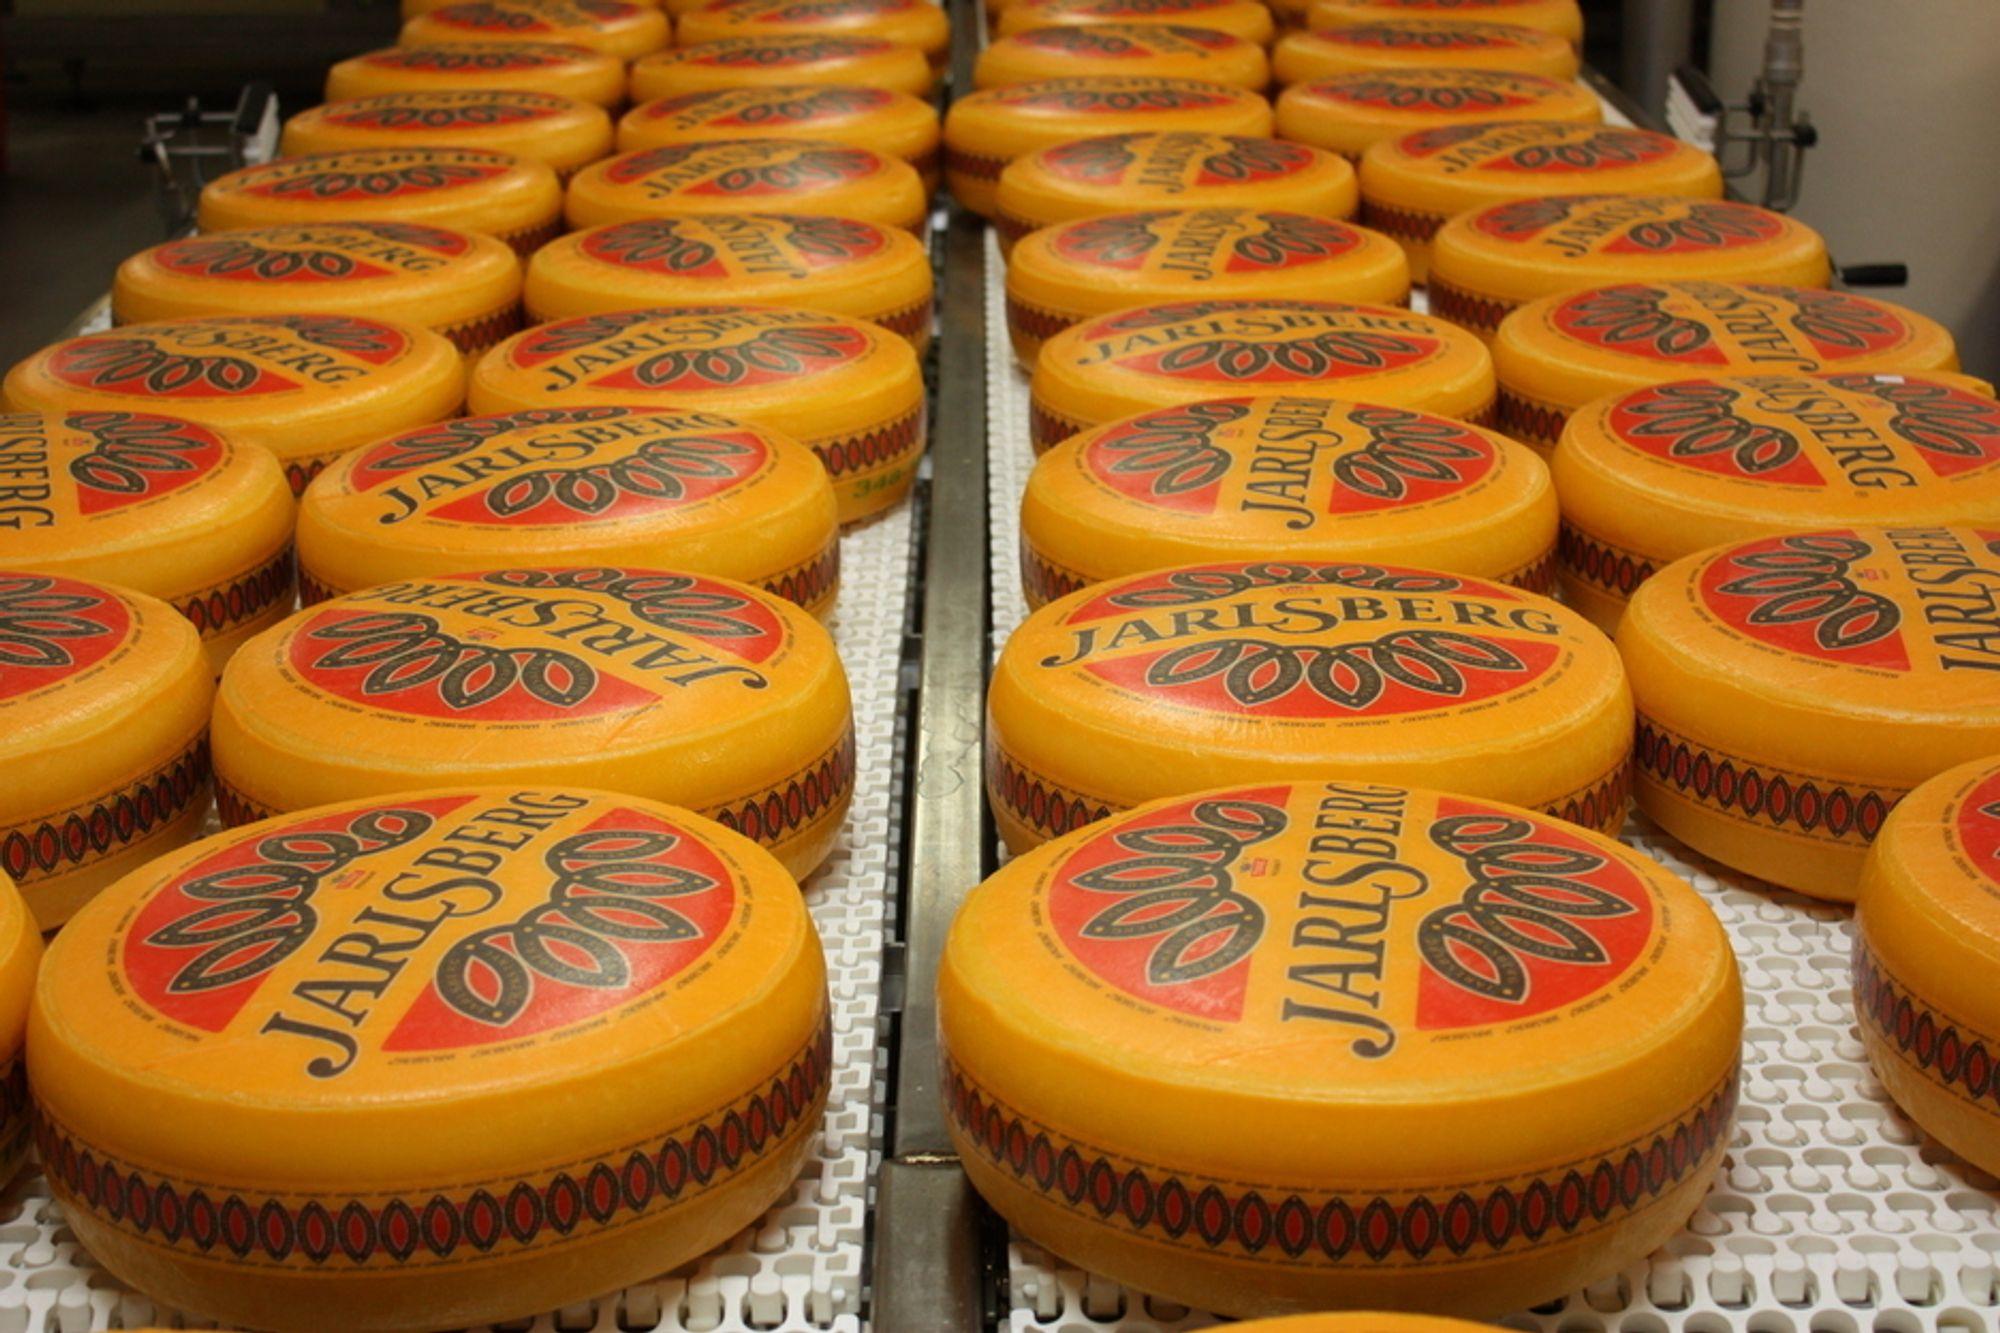 STØRSTE INDUSTRI: Næringsmiddelindustrien i Norge, her ved osten Jarlsberg, er den største industrien i landet med et salg på 122 milliarder kroner i 2010. Samlet vokste norsk industri med 3,7 prosent i fjor.